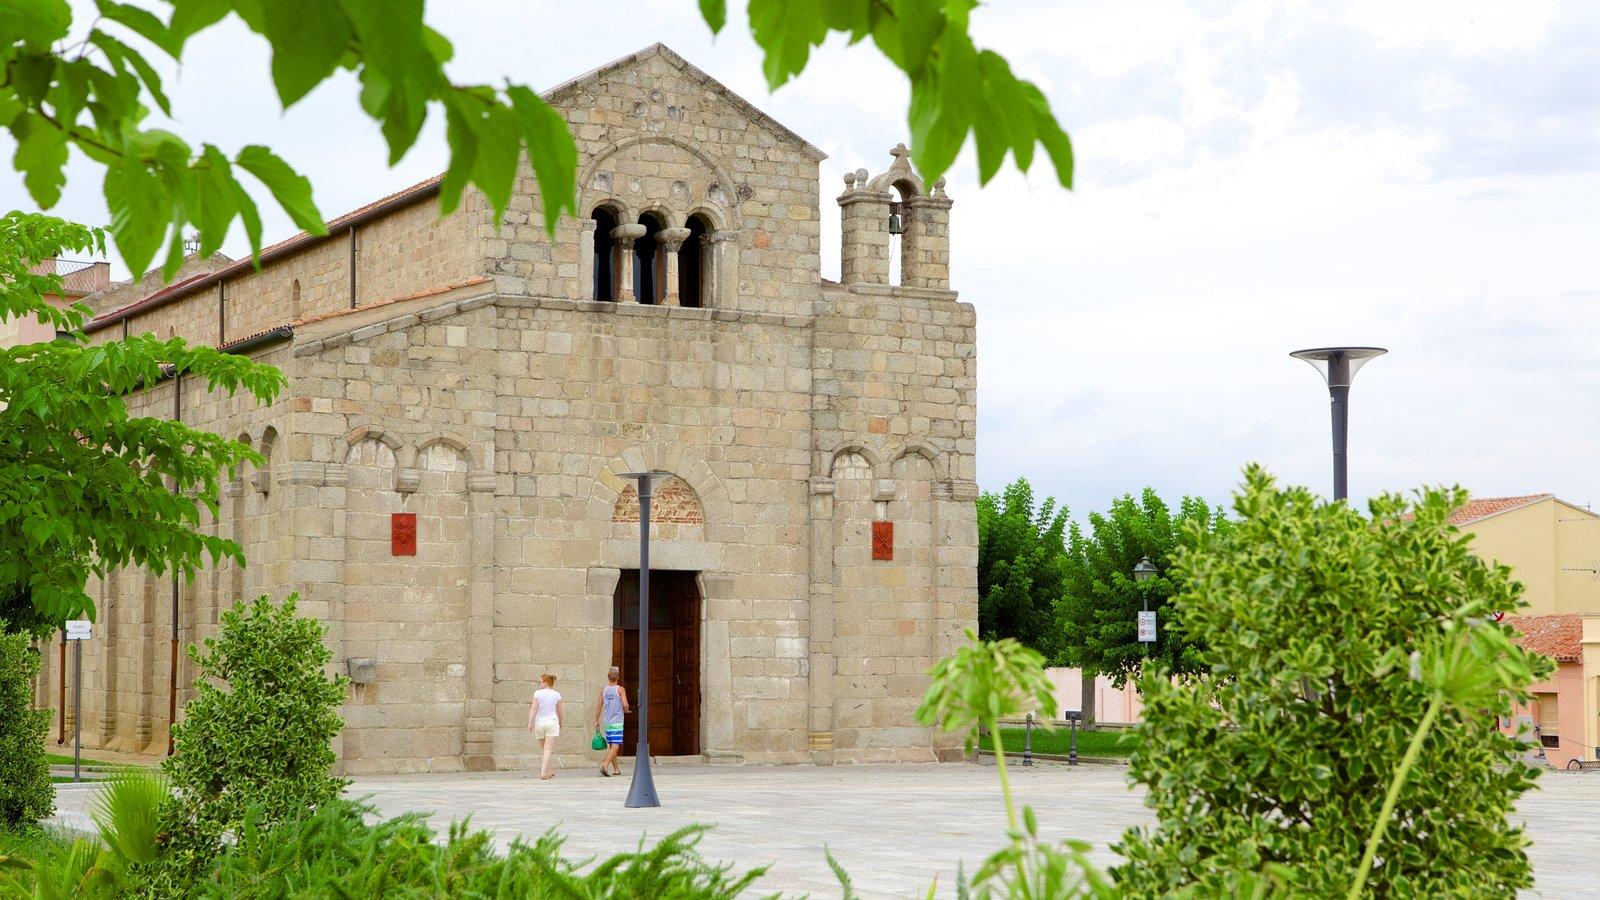 Basilica of San Simplicio which includes heritage architecture and a square or plaza